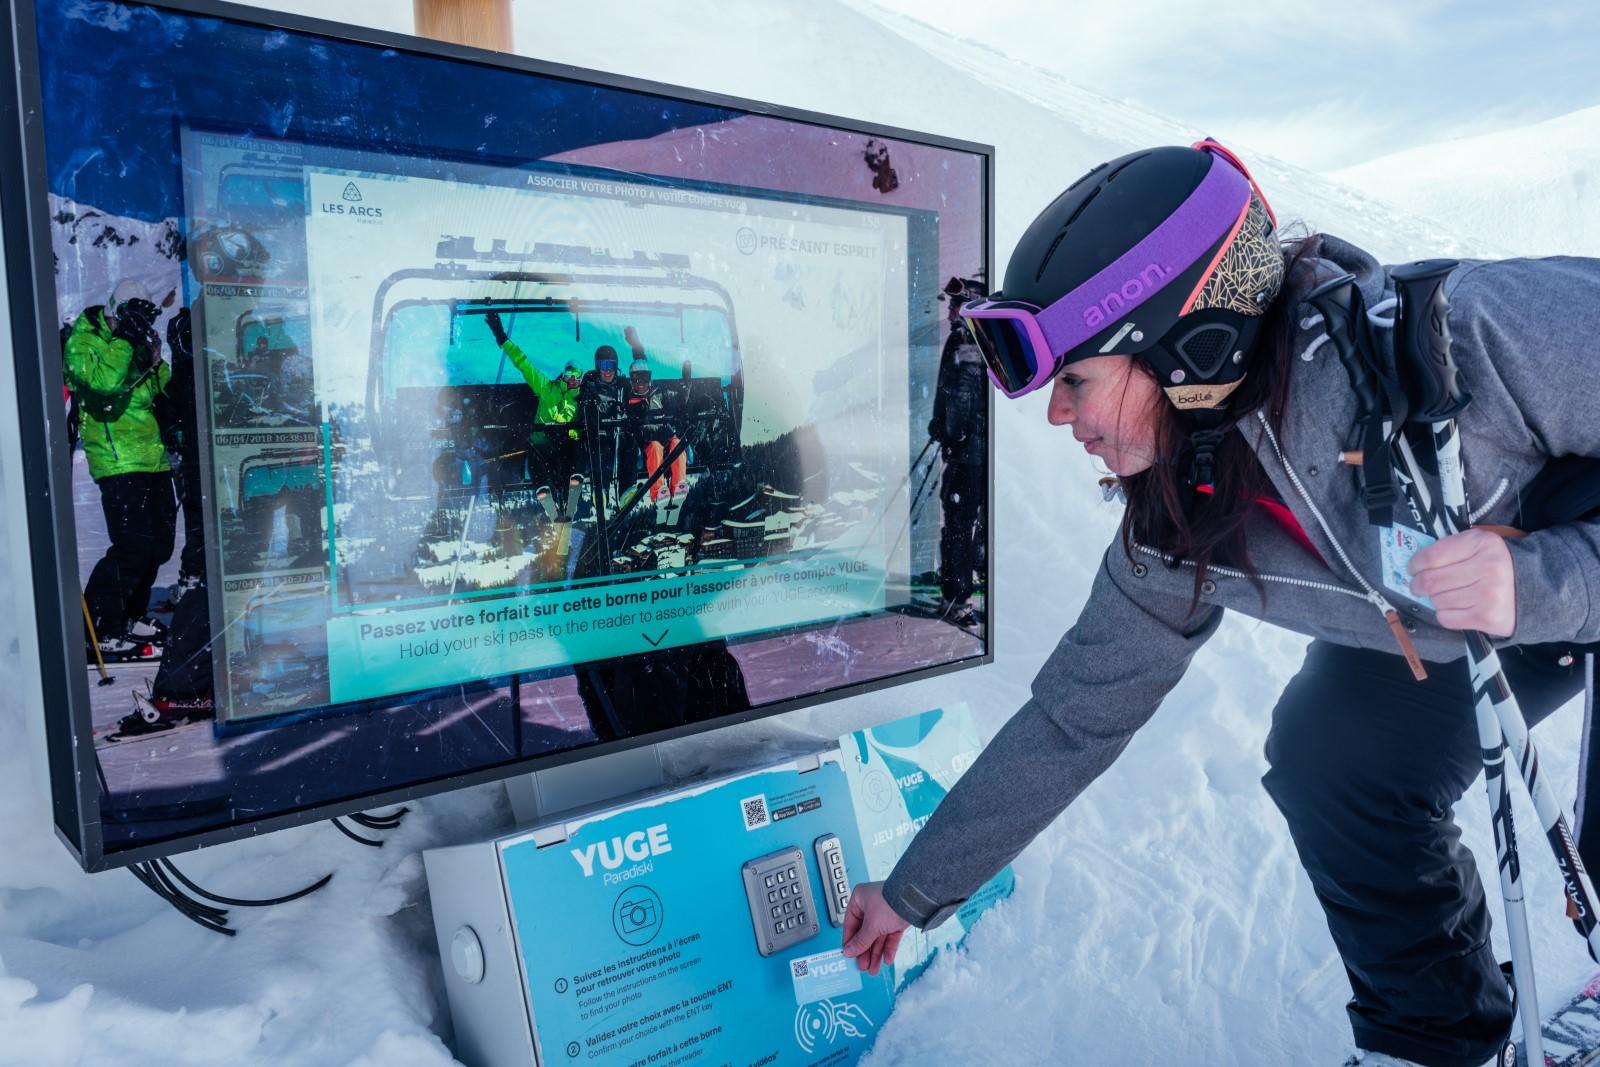 l'application Paradiski Yuge, pour vivre le domaine skiable Les Arcs - Paradiski en grand